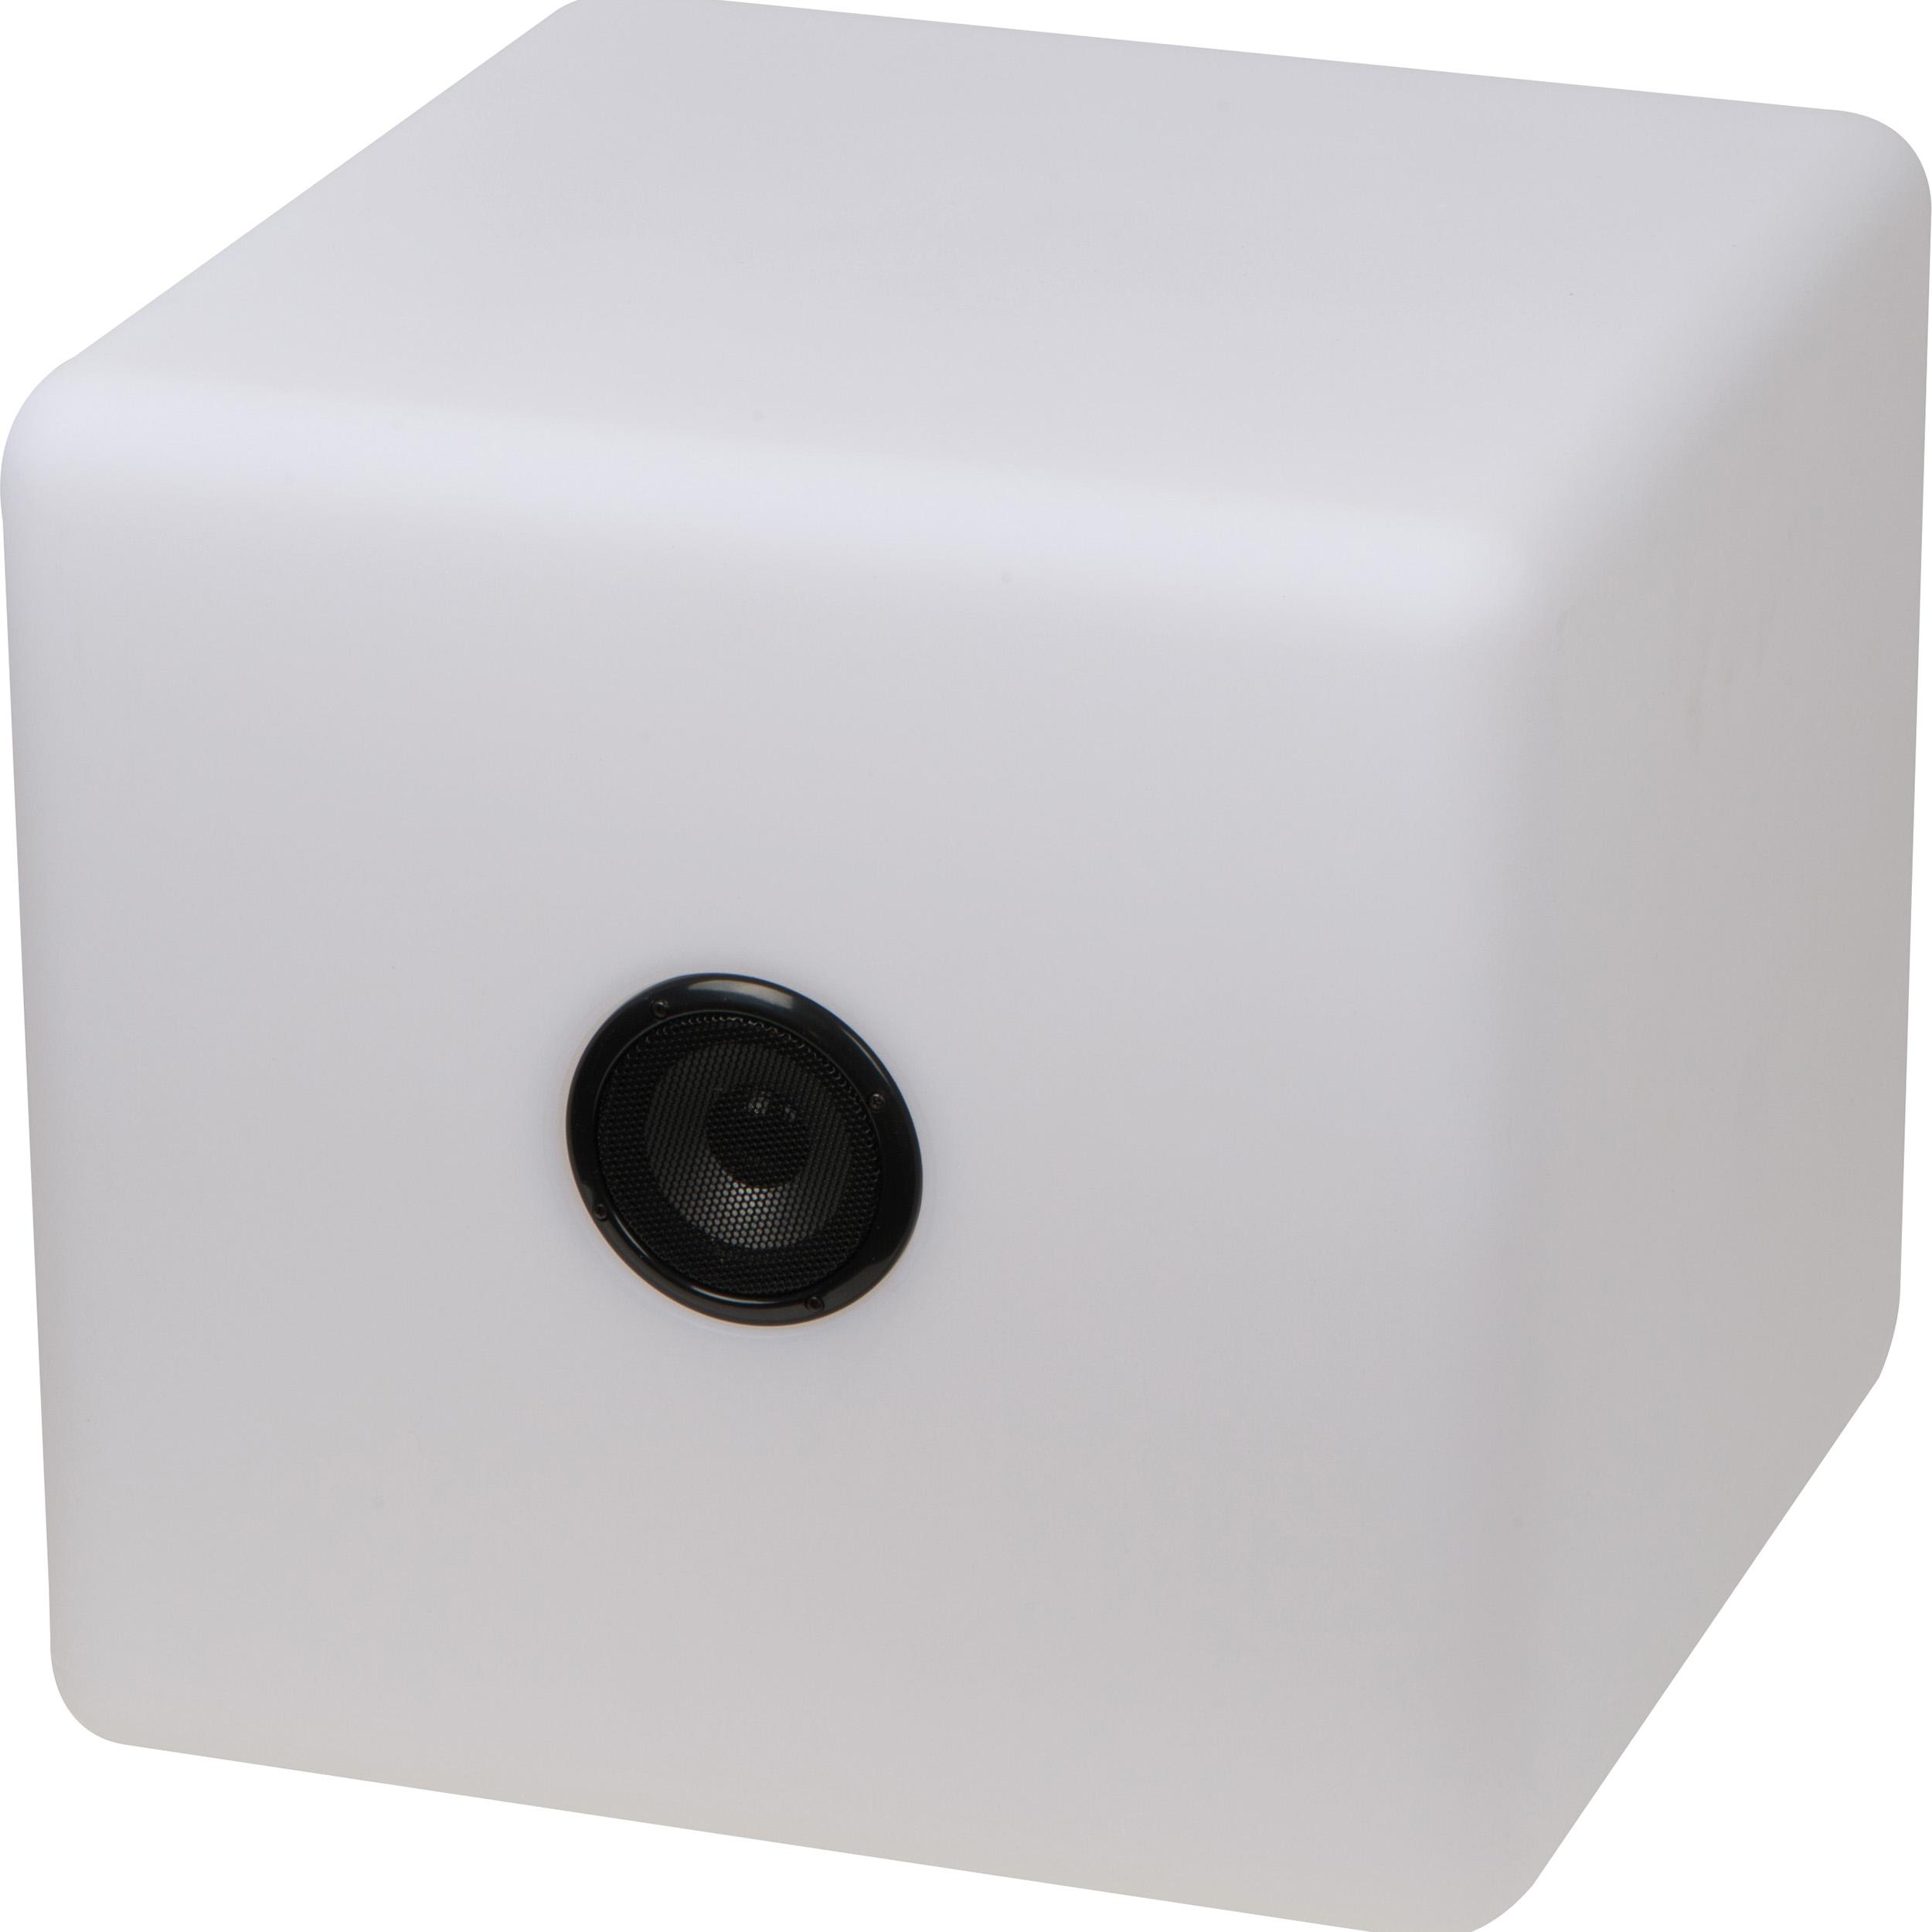 XXL Bluetooth Lautsprecher mit wechselnder LED-Beleuchtung, 2.200 mAh